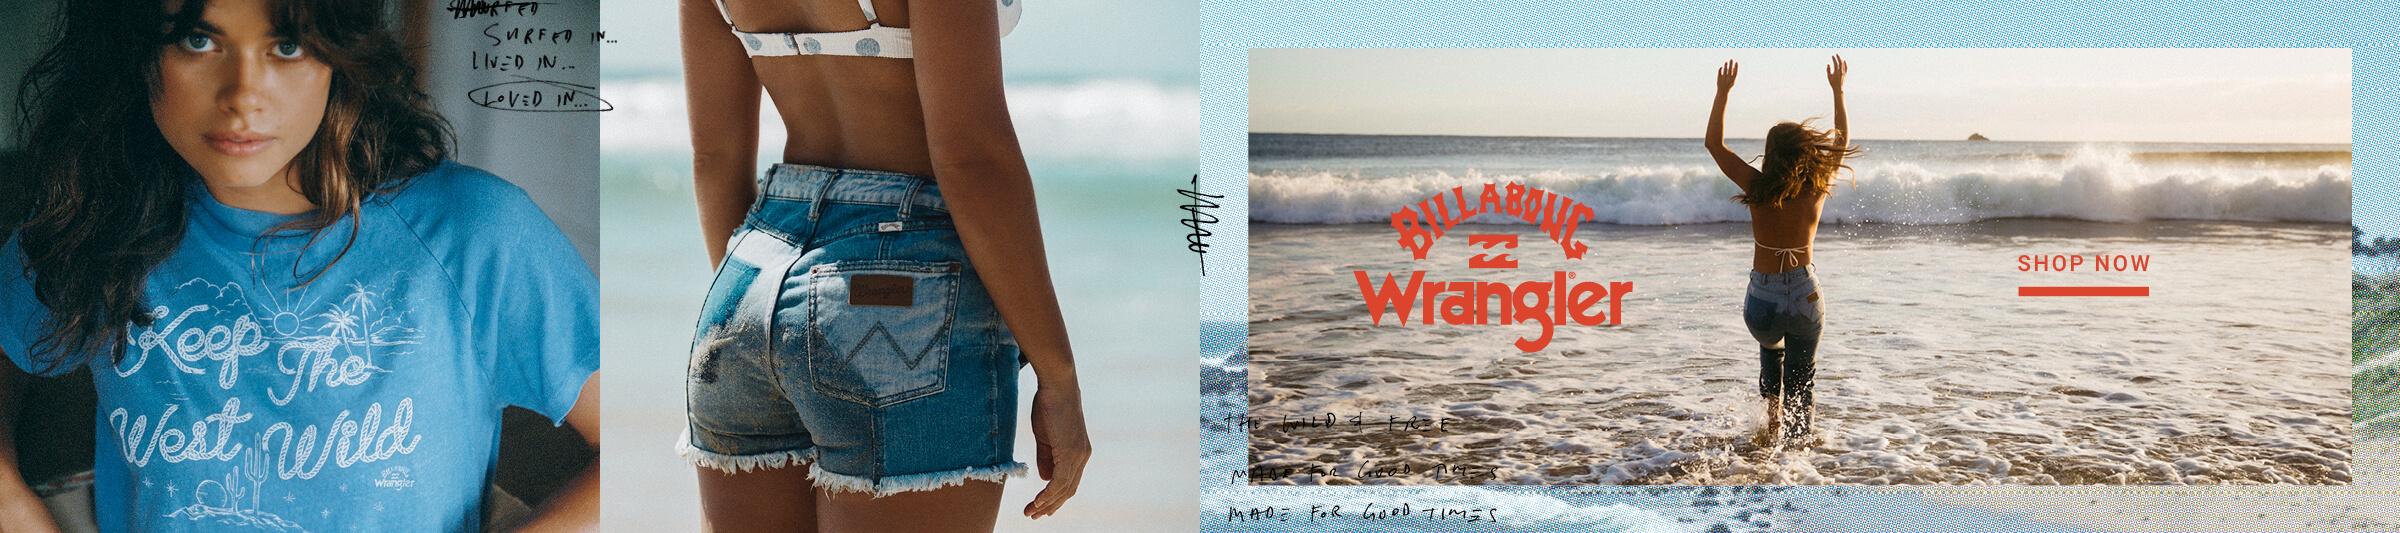 Billabong x Wrangler - Shop Now - Gal wearing a Billabong swim top and Wrangler Jeans in the ocean.